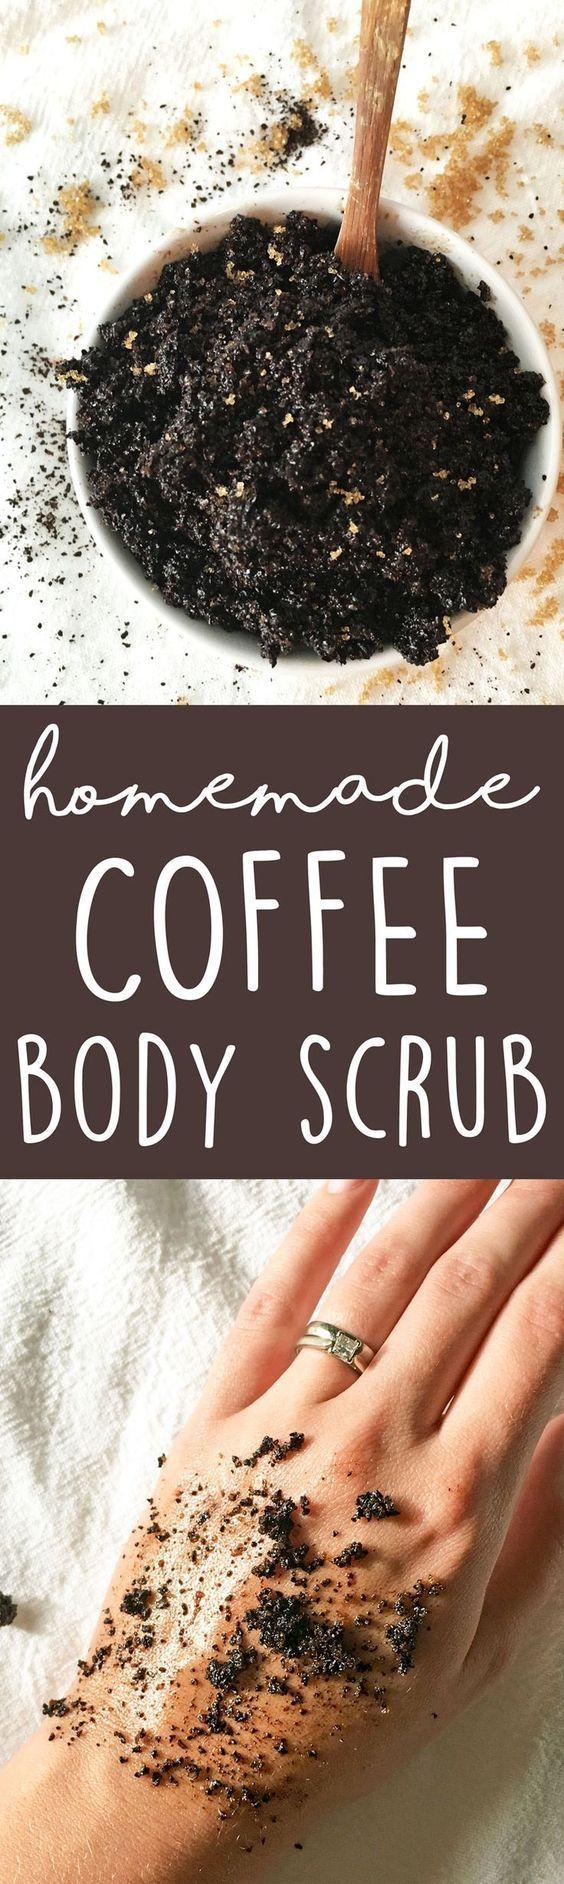 DIY Coffee Body Scrub - this 3-ingredient homemade body scrub recipe is great for dry skin & exfoliating. LOVE it! | thecrunchychronic... -…